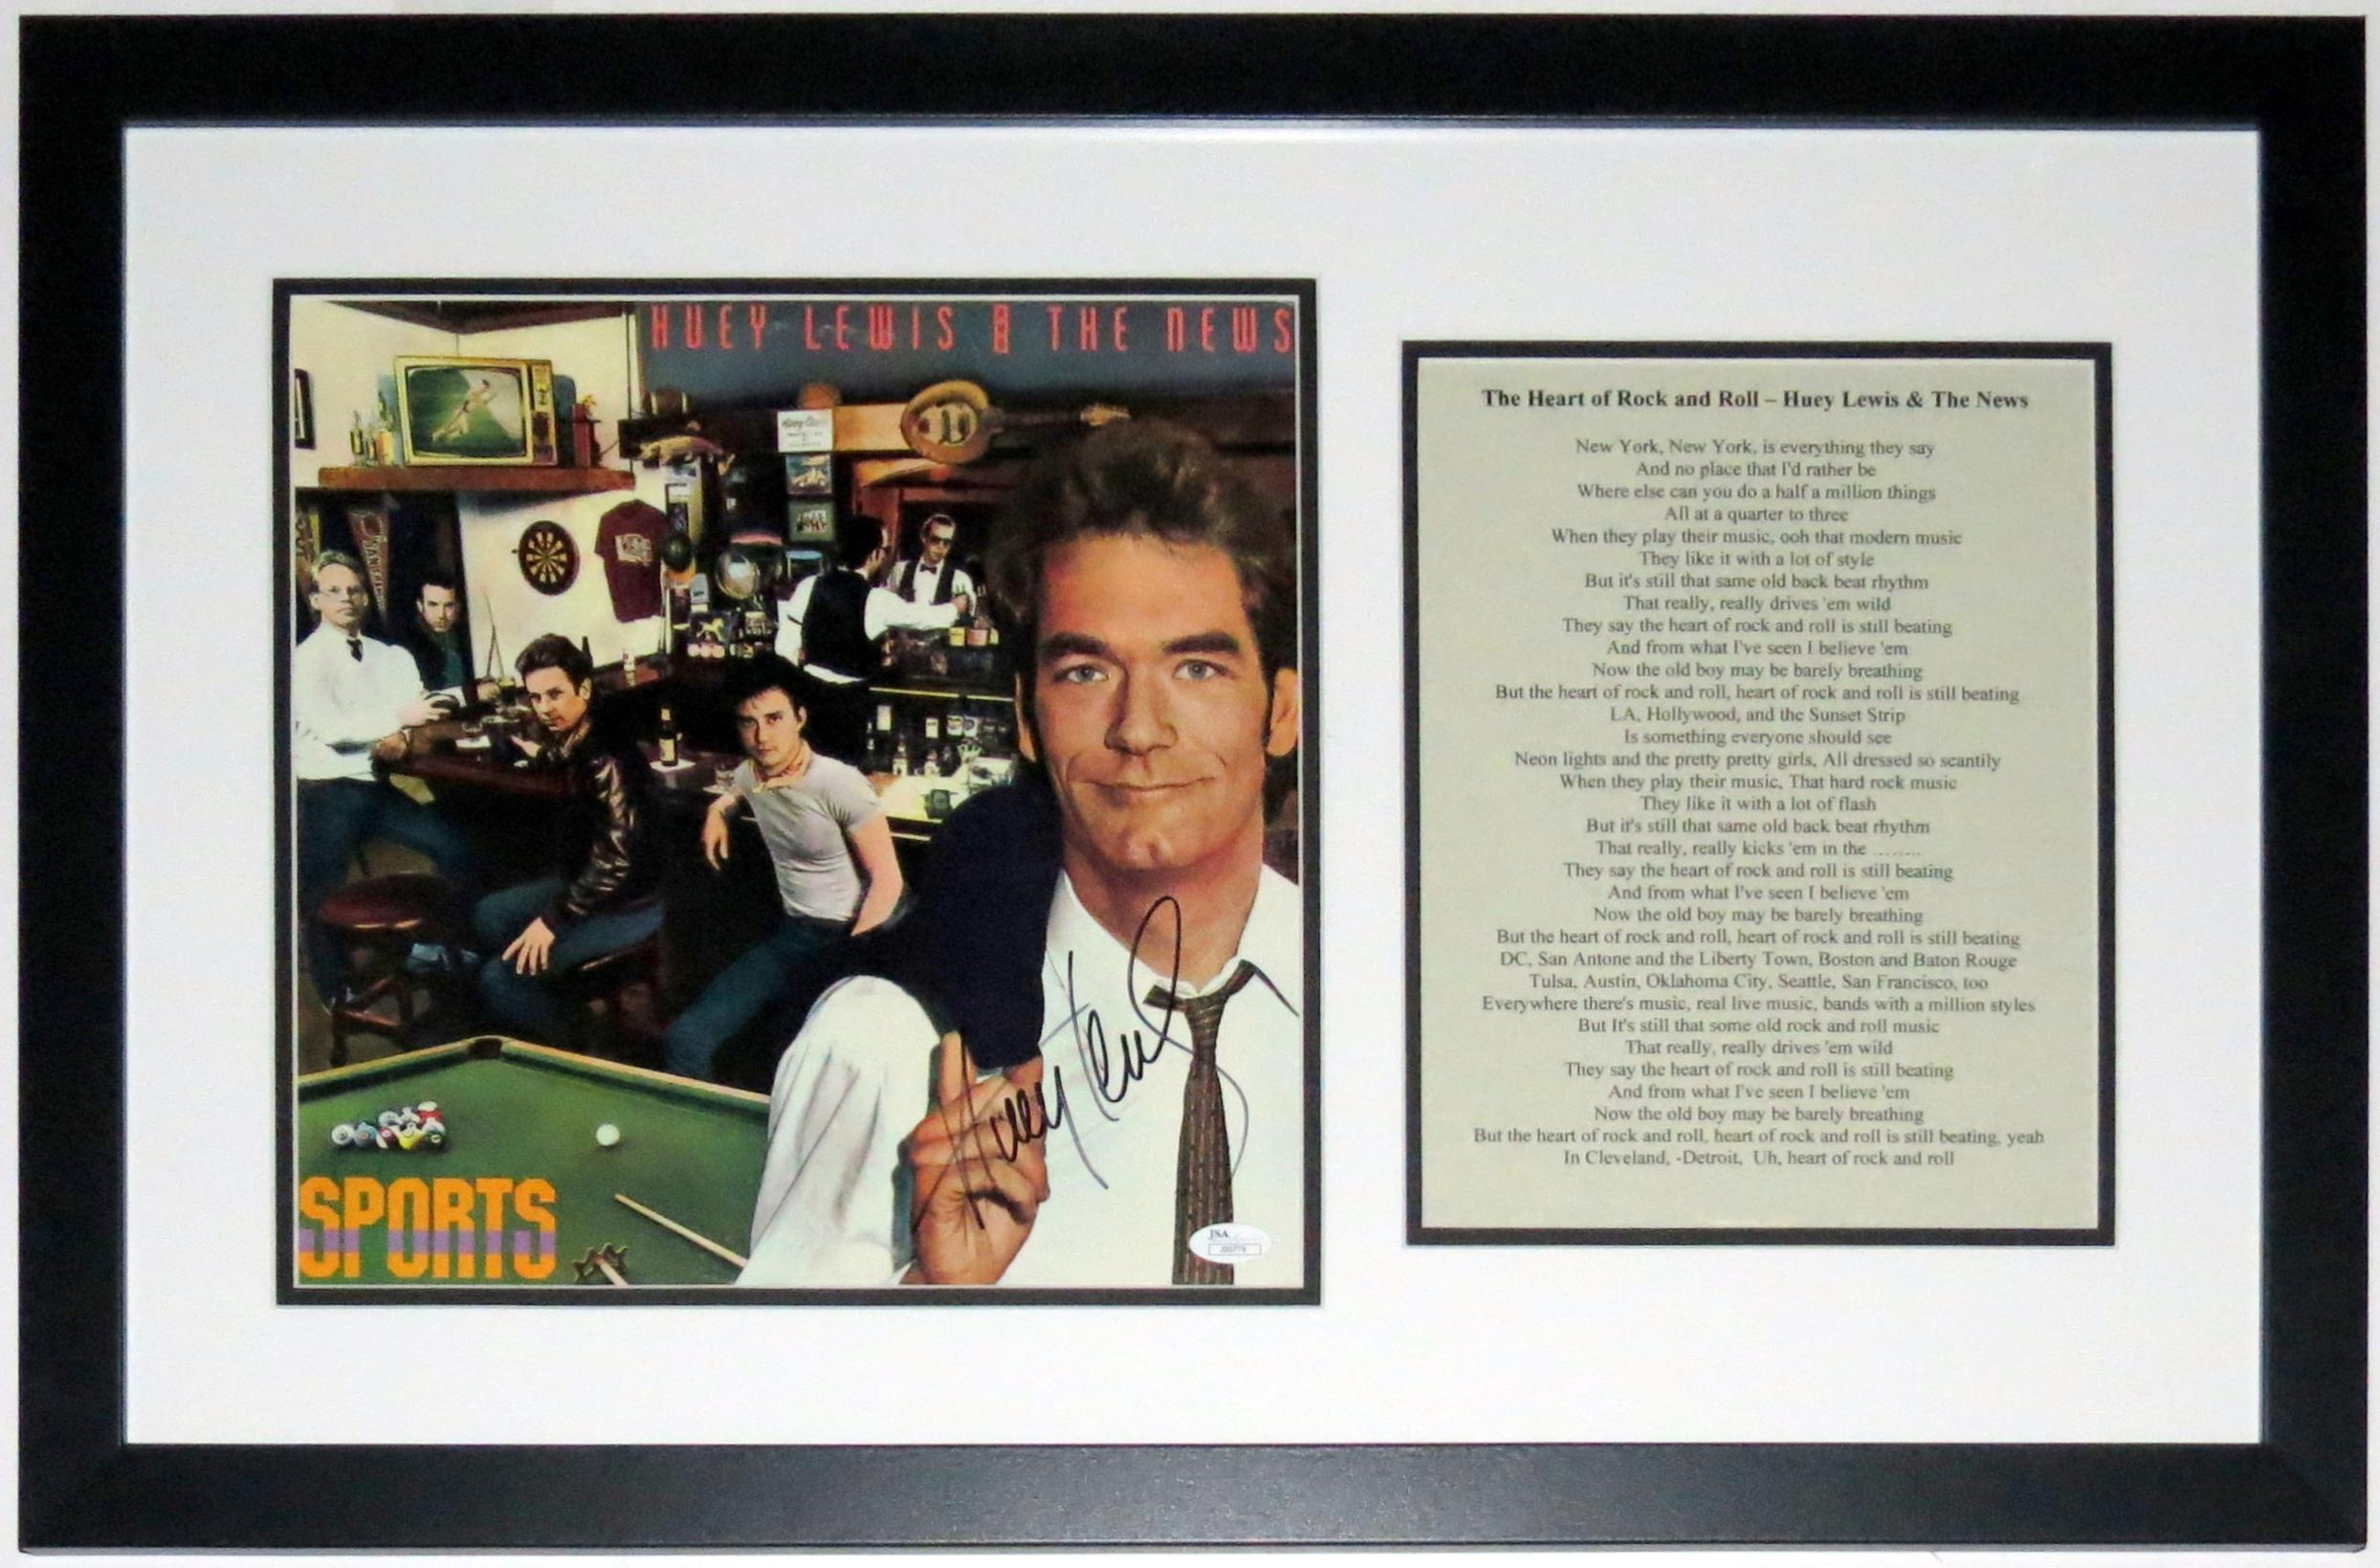 Huey Lewis Signed Huey Lewis and the News Sports Album - JSA COA Authenticated - Custom Framed & Lyrics 28x18